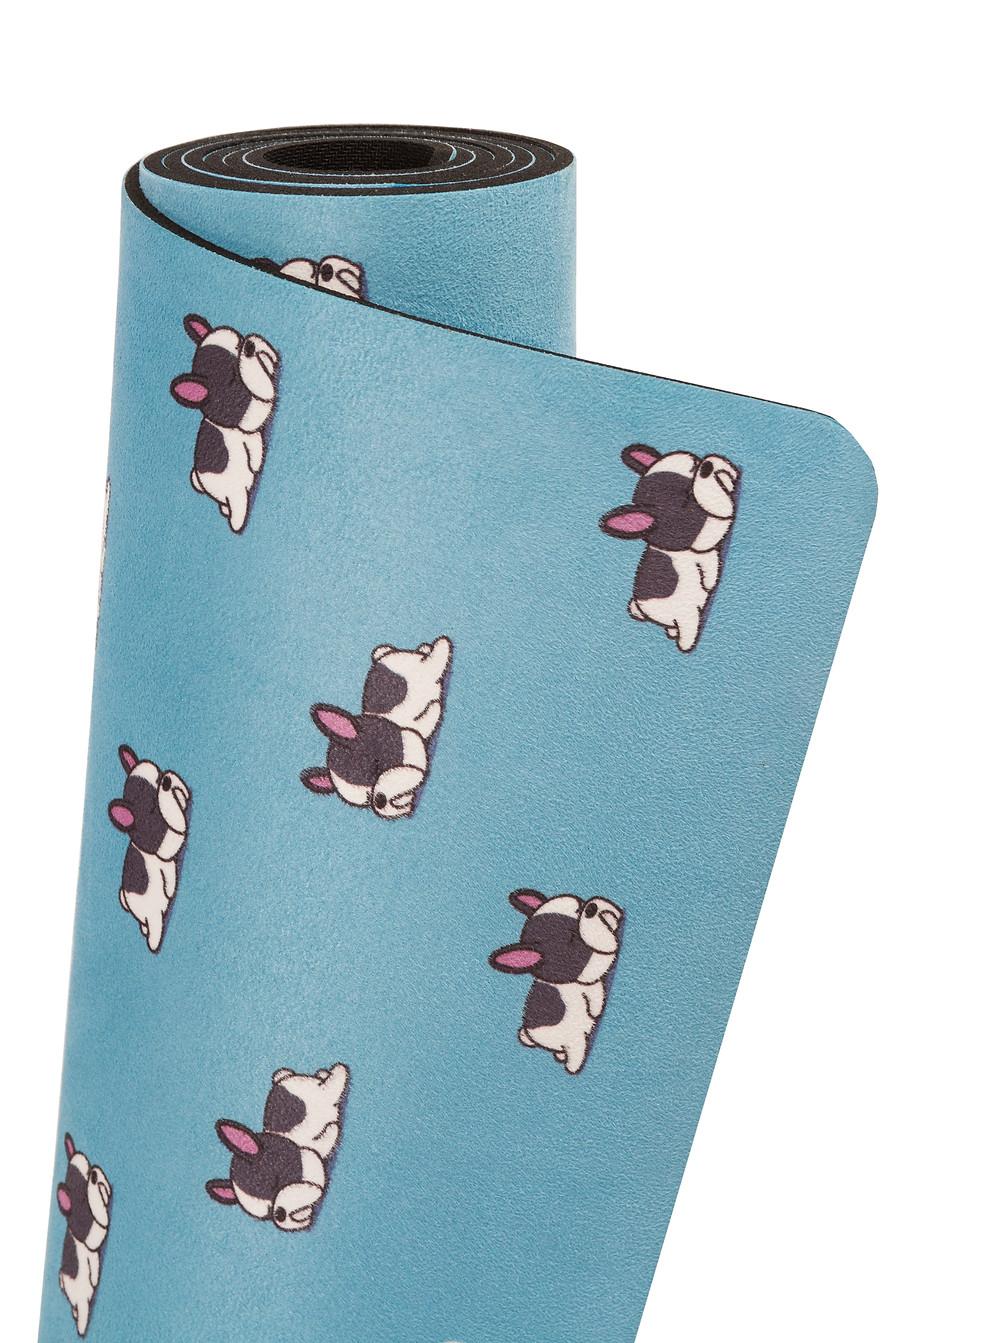 BADJER Eco Yoga Mat in Blue Dog Print